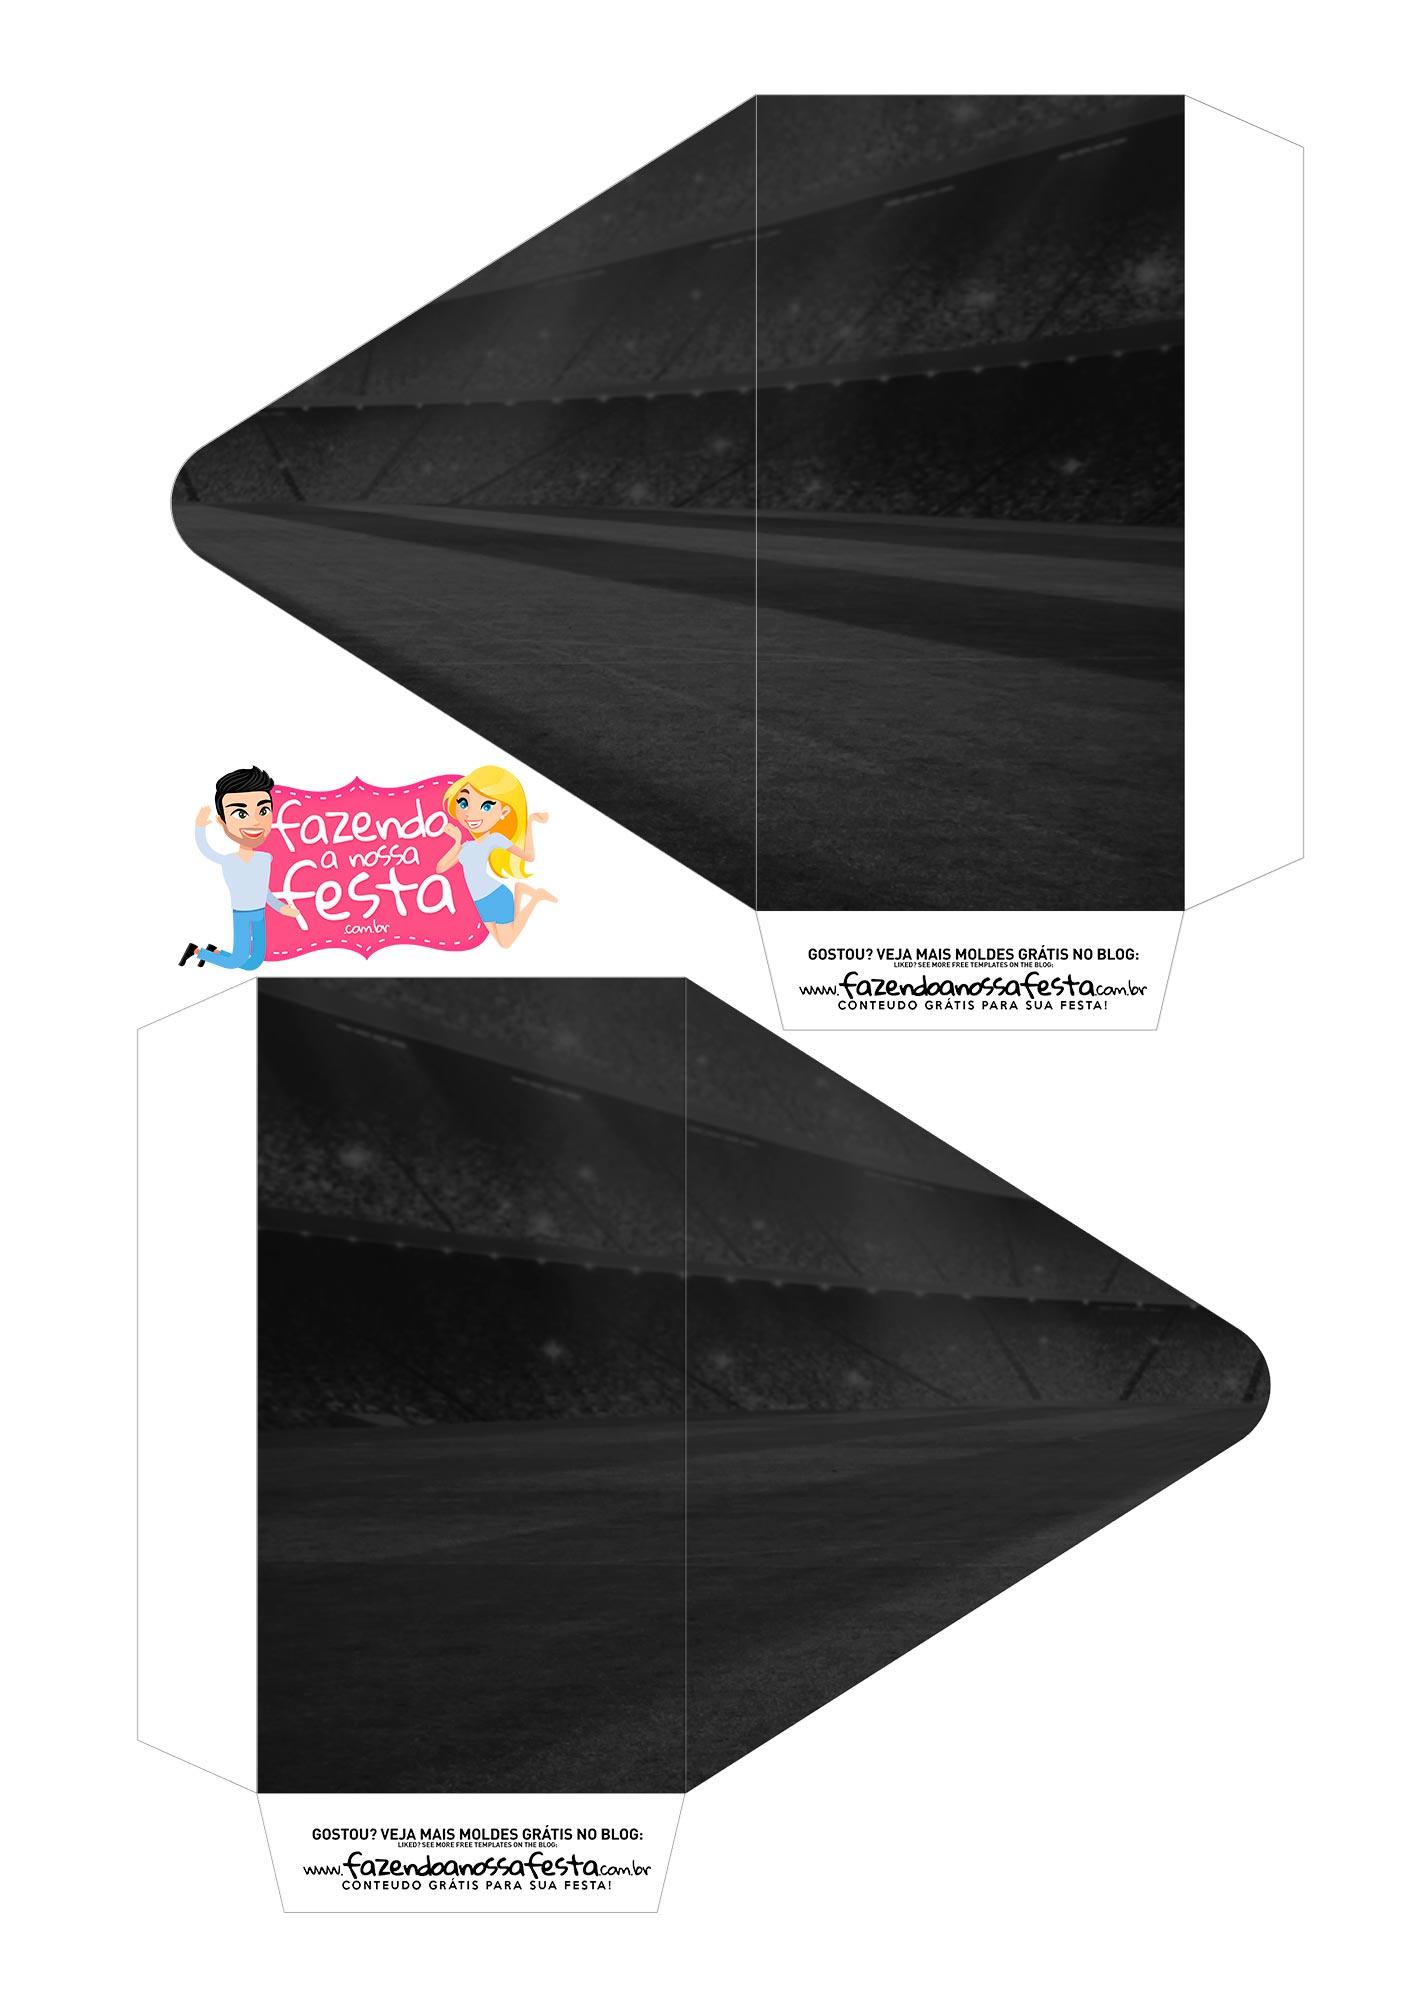 Caixa Envelope Atletico MG 1